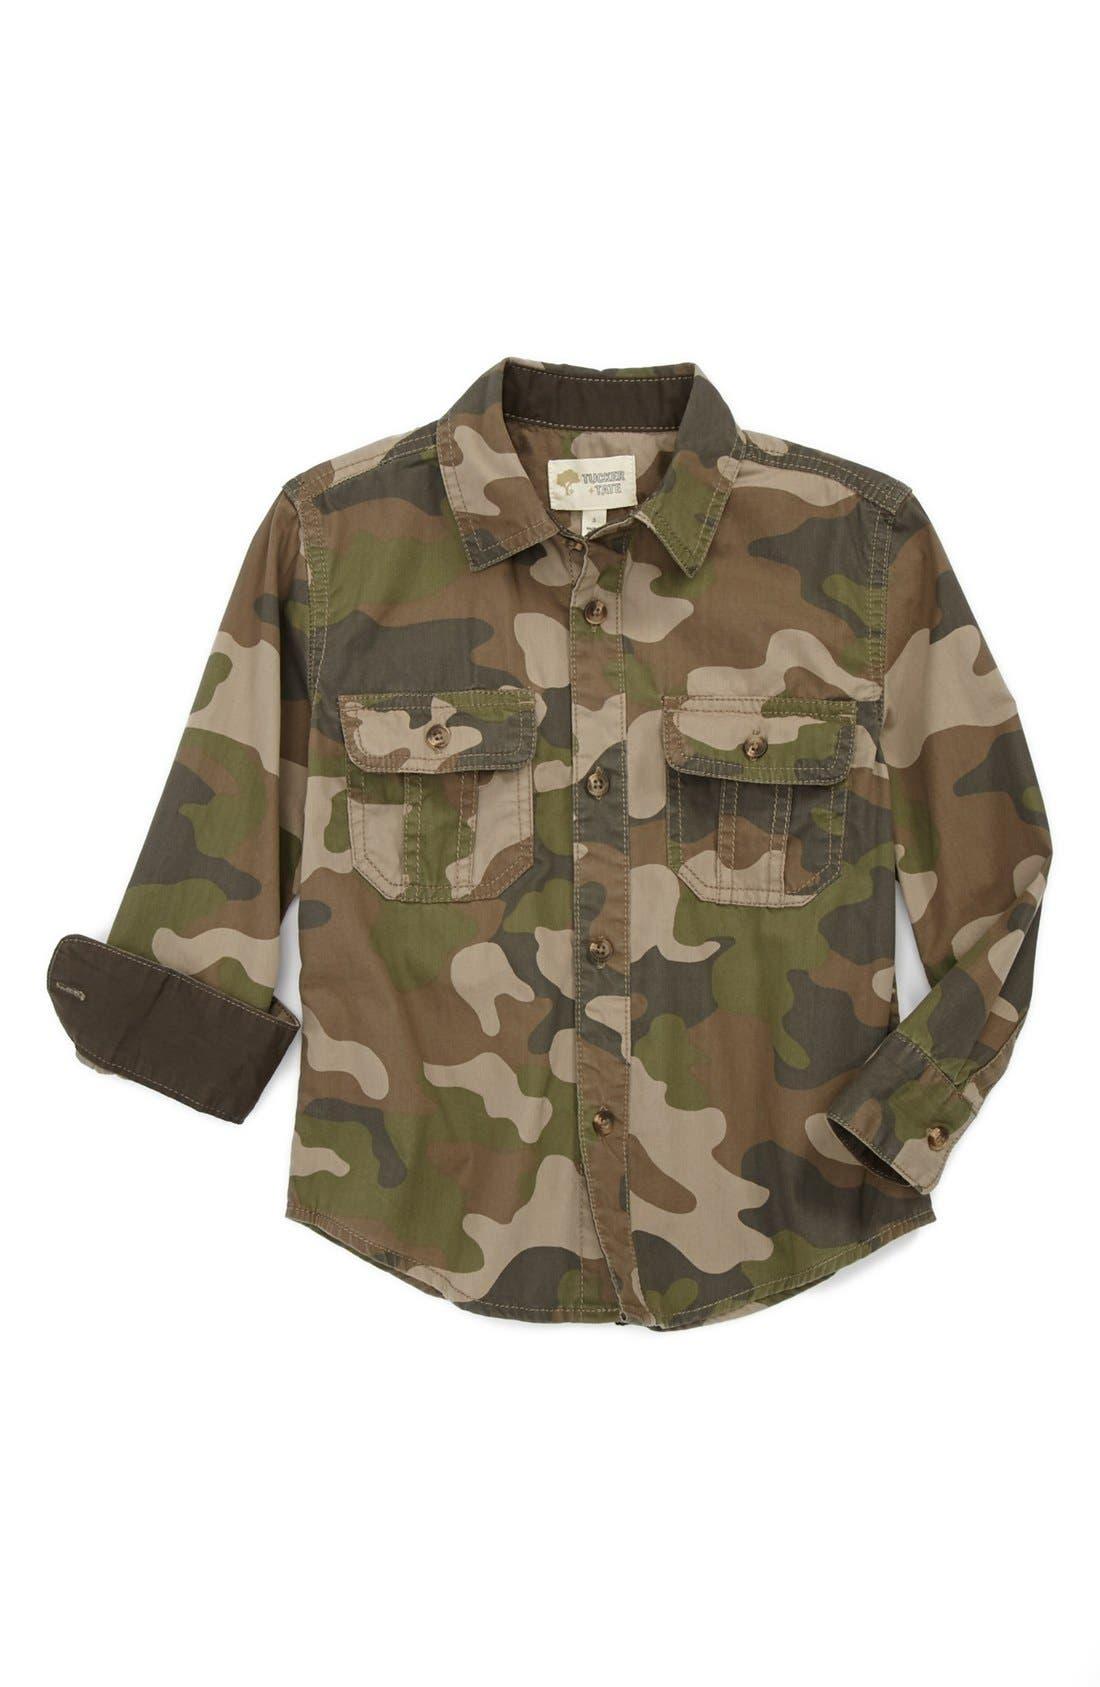 Alternate Image 1 Selected - Tucker + Tate 'Ackley' Woven Shirt (Toddler Boys)